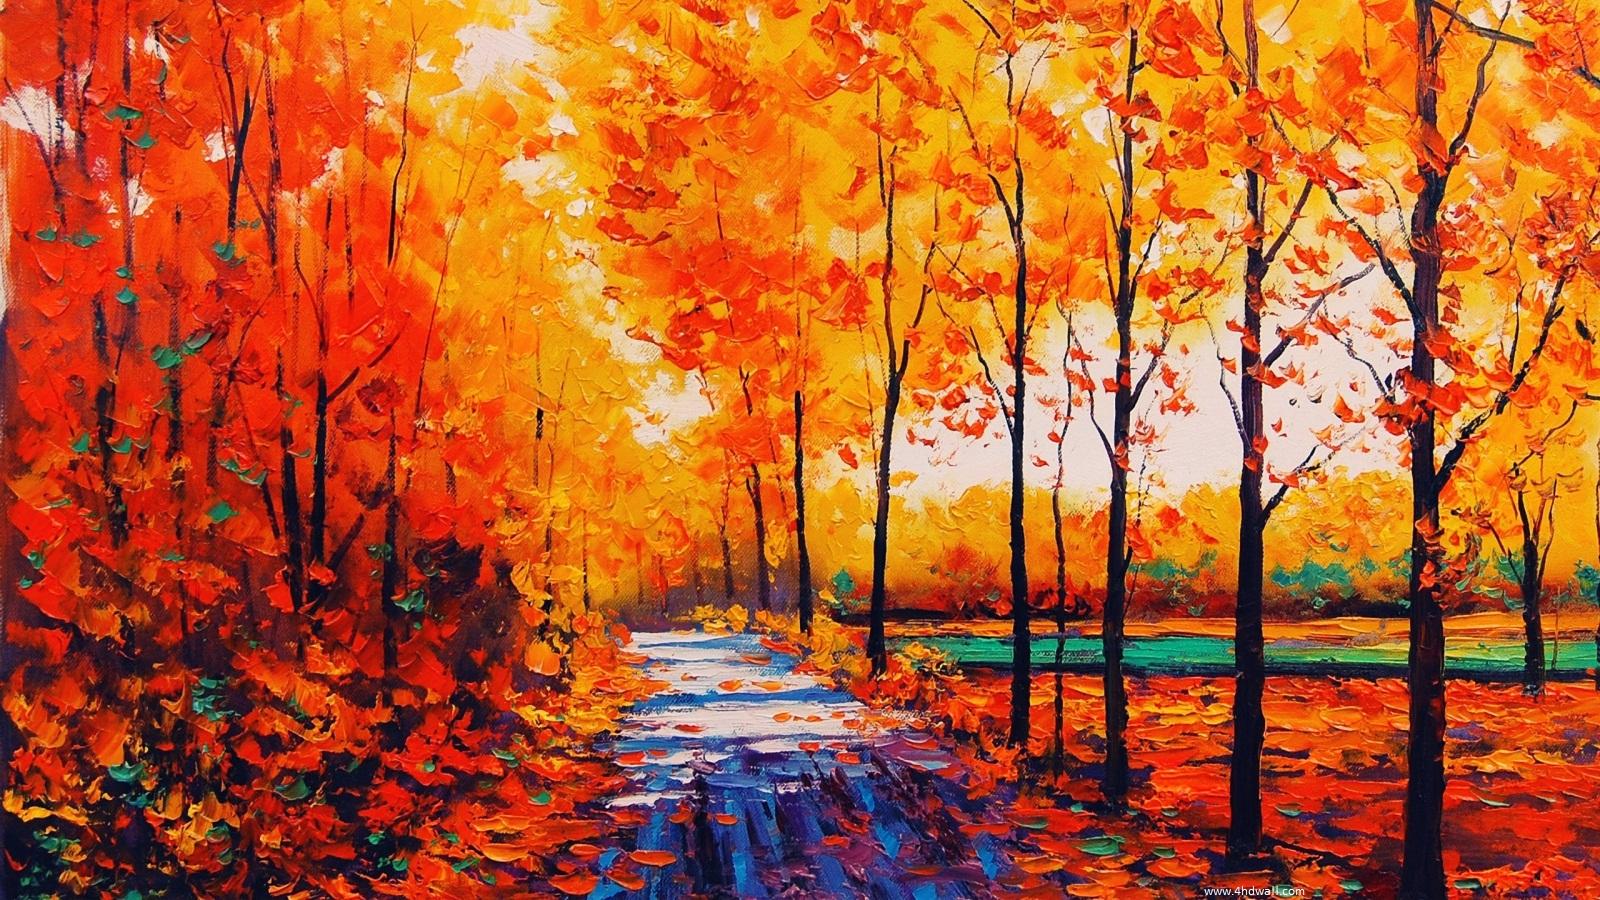 Home Nature Landscapes Fall Season Desktop Background 1600x900